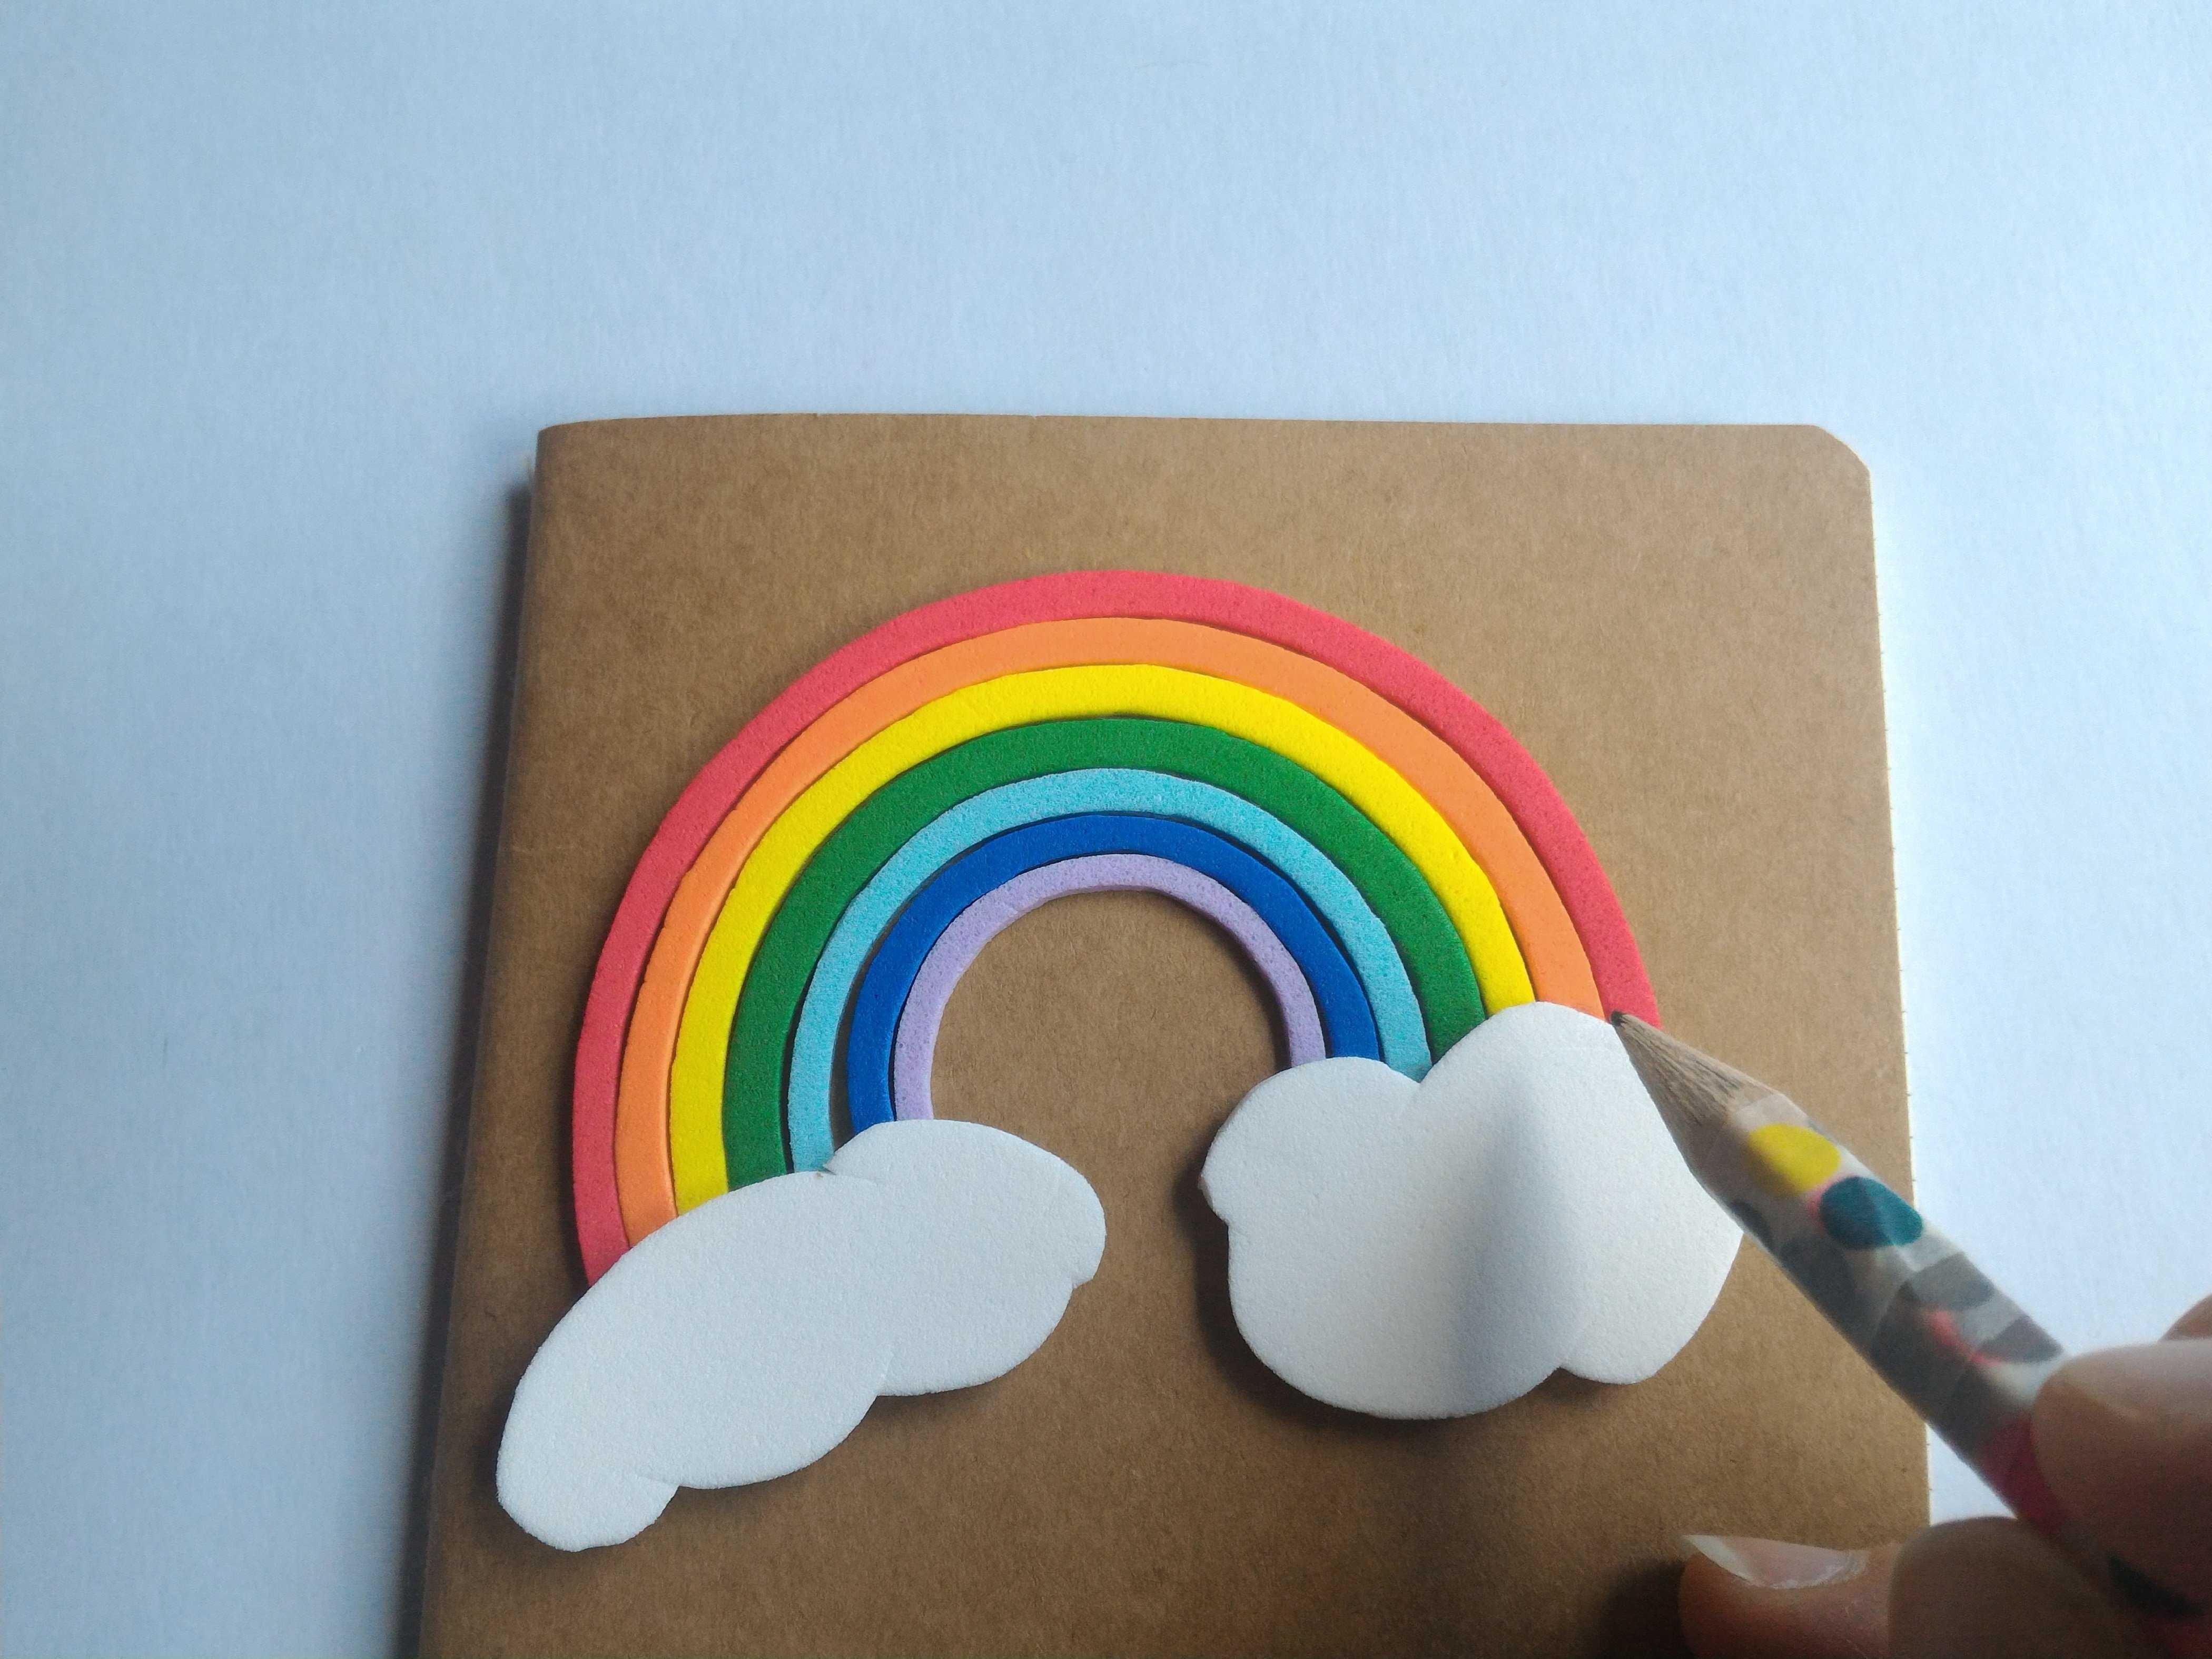 Medium 11   oam   ouiareclafc   rainbow   chagaz et vous